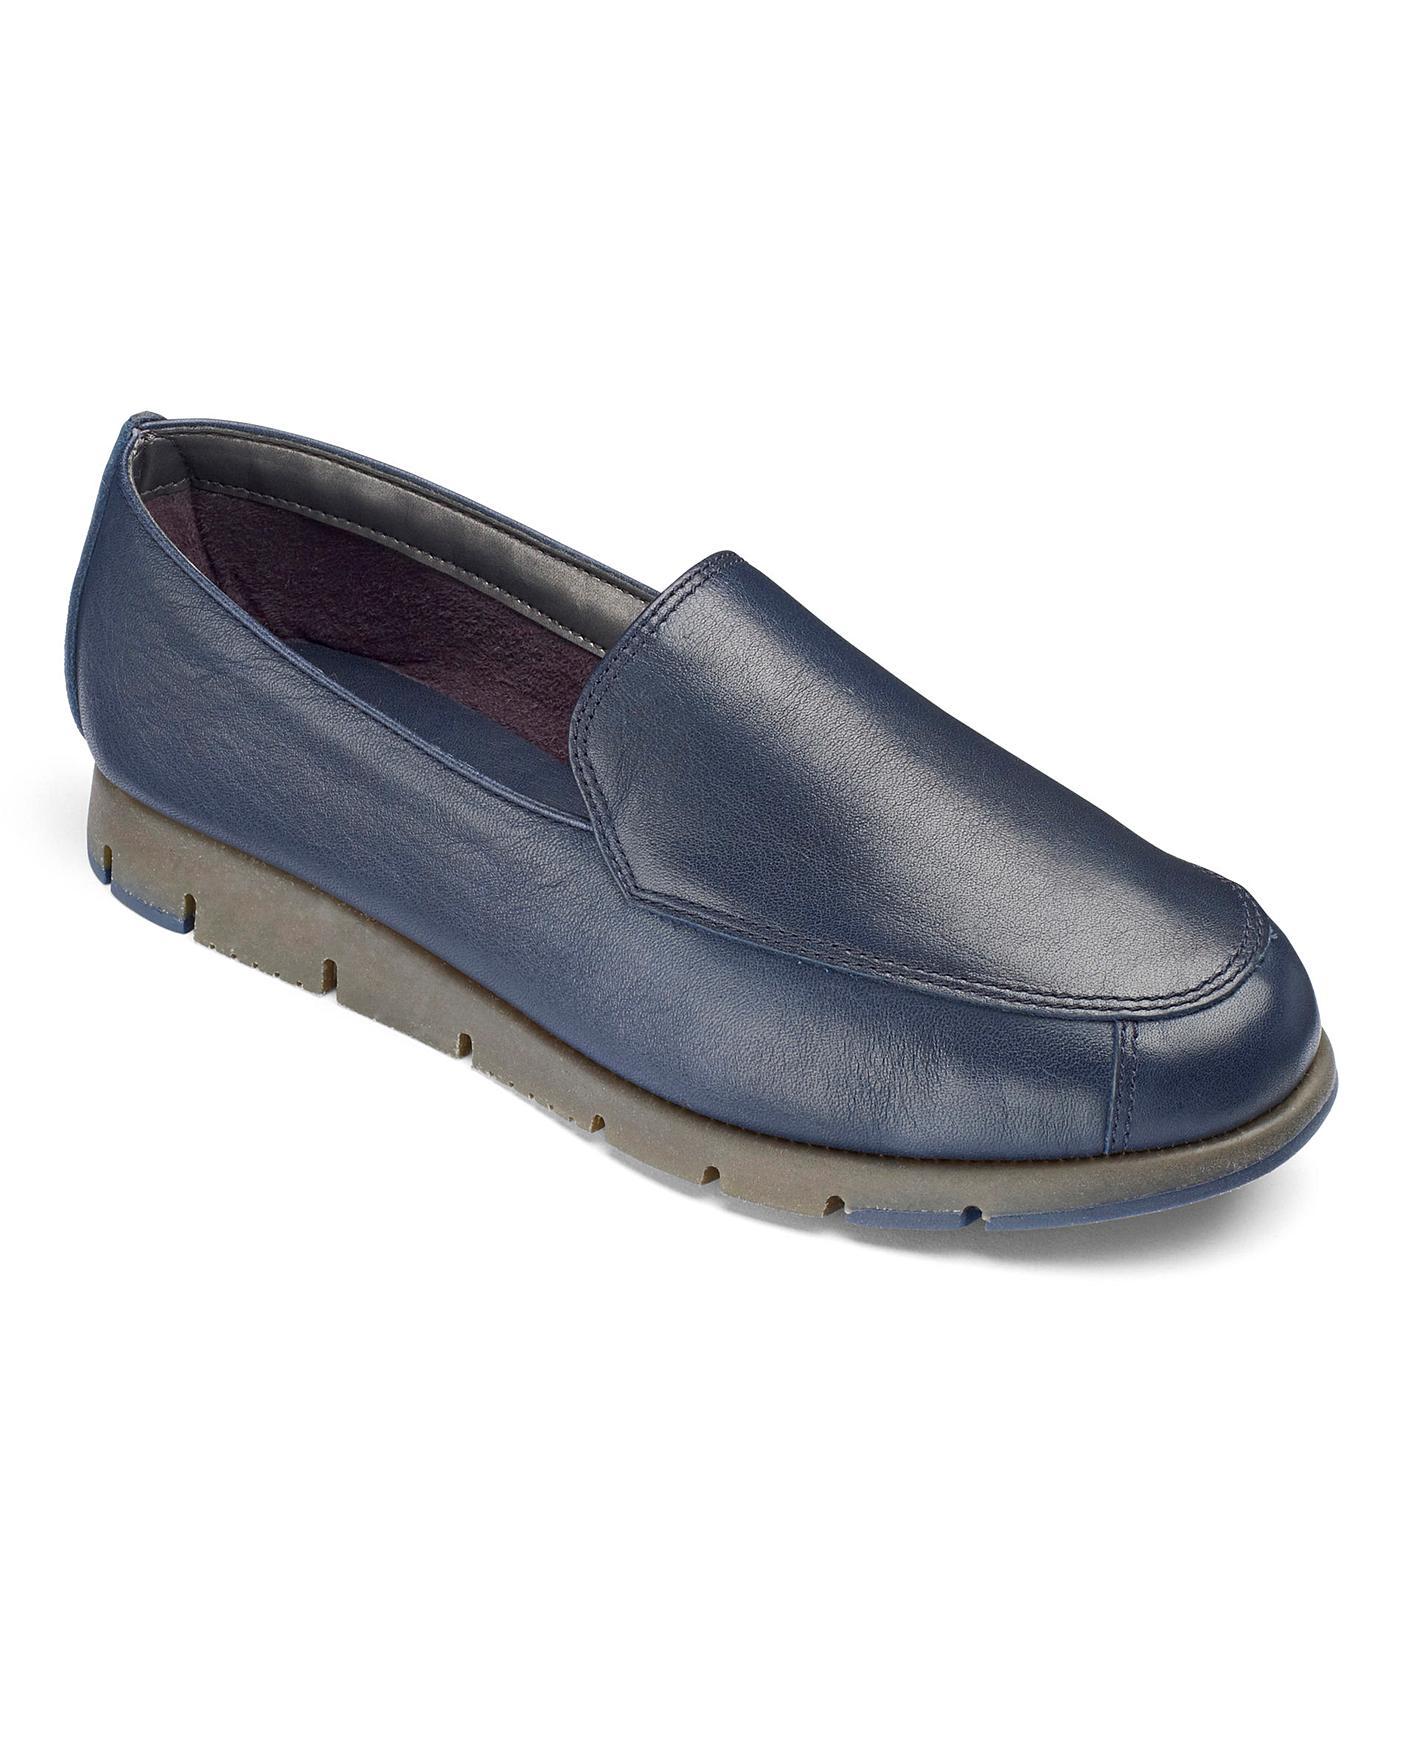 Aerosoles Flexible Slip On Shoes E Fit